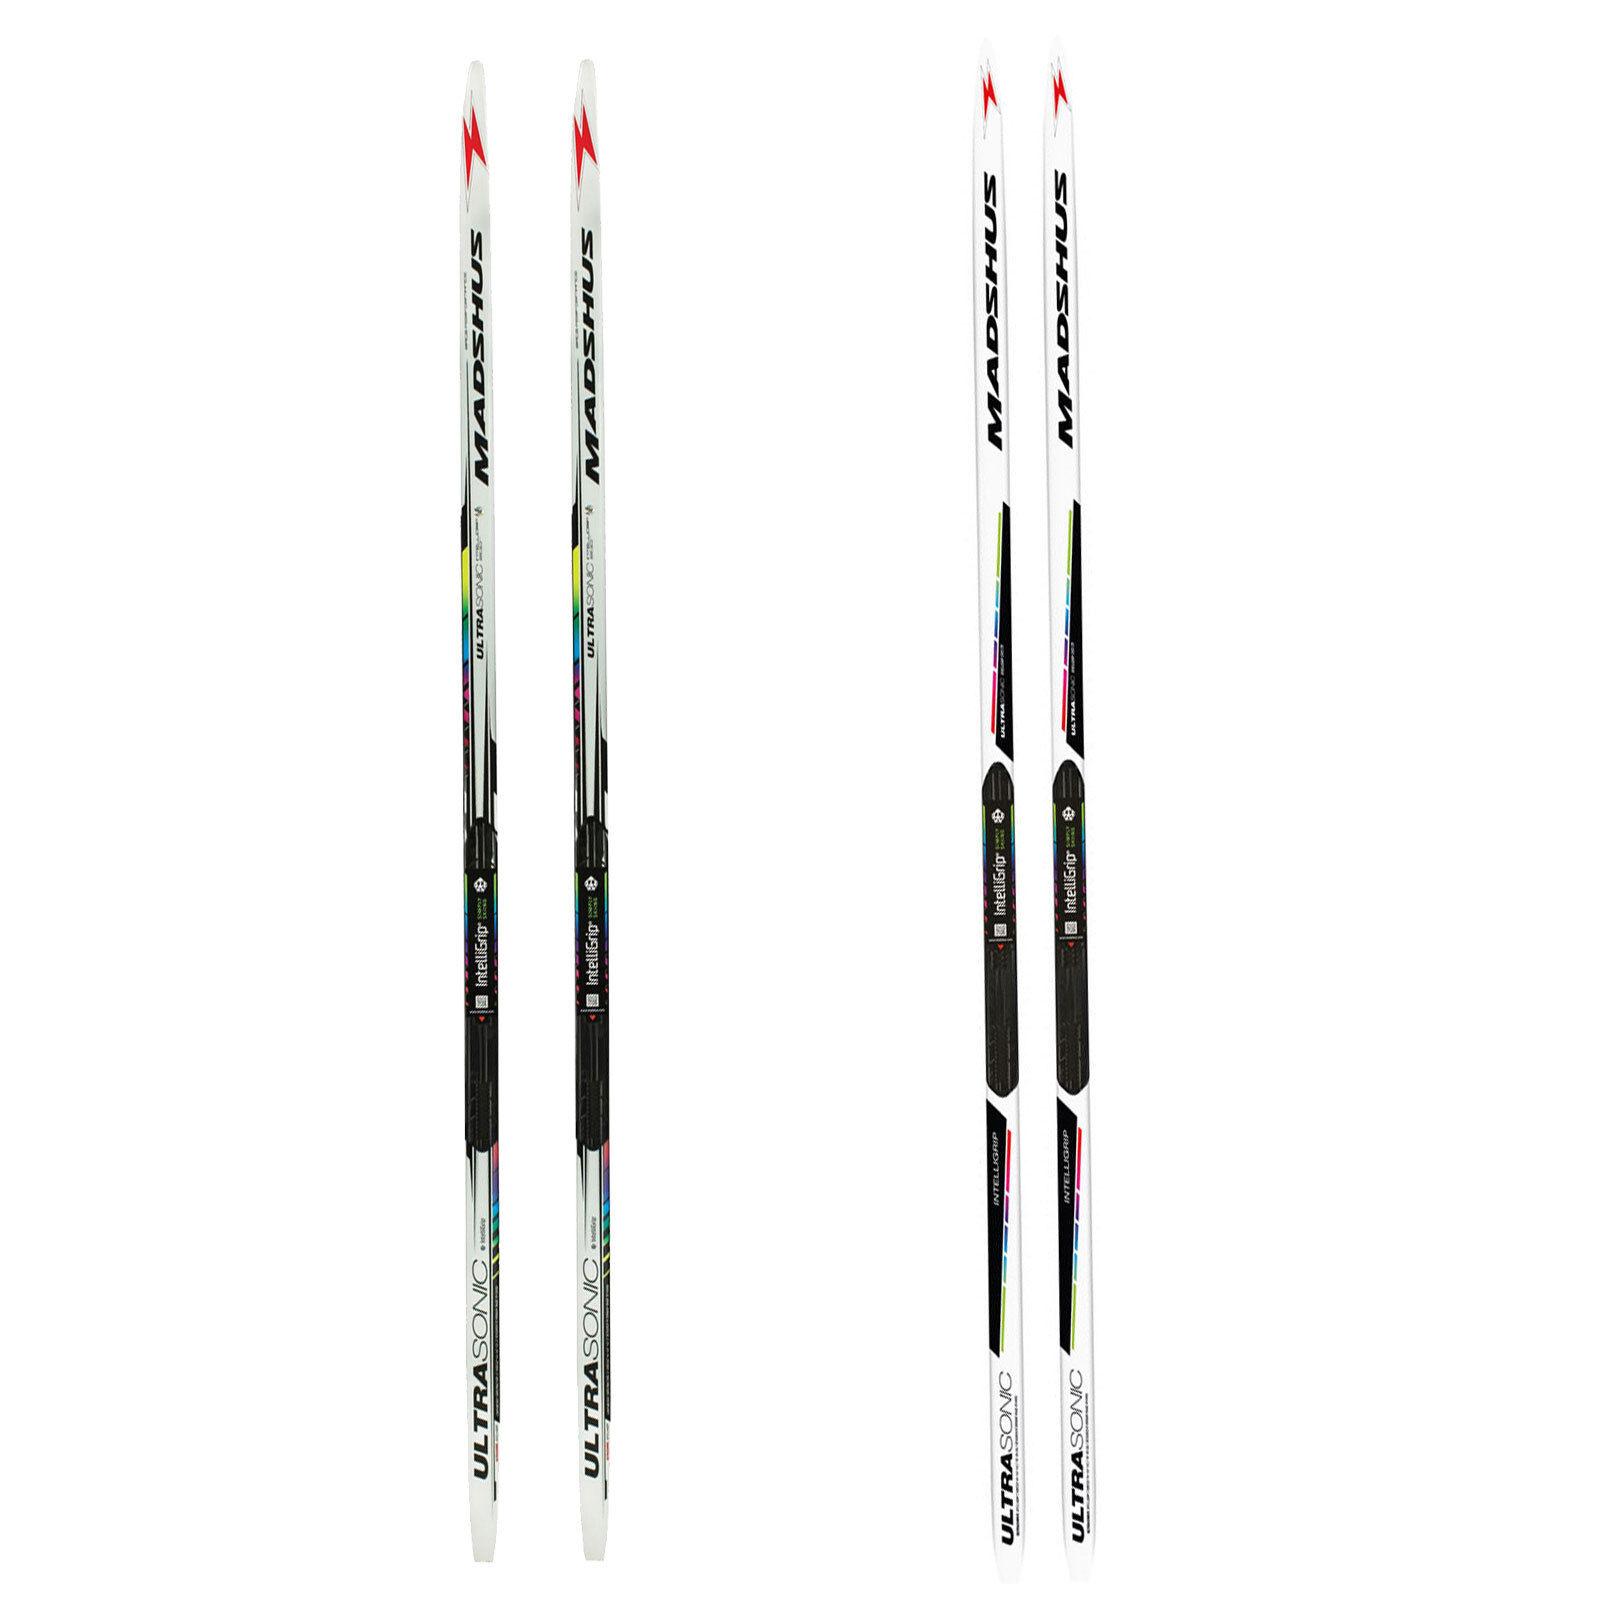 Madshus Ultrasonic Classic IntelliGrip Unisex Cross -country åka skidor åka skidordåkning